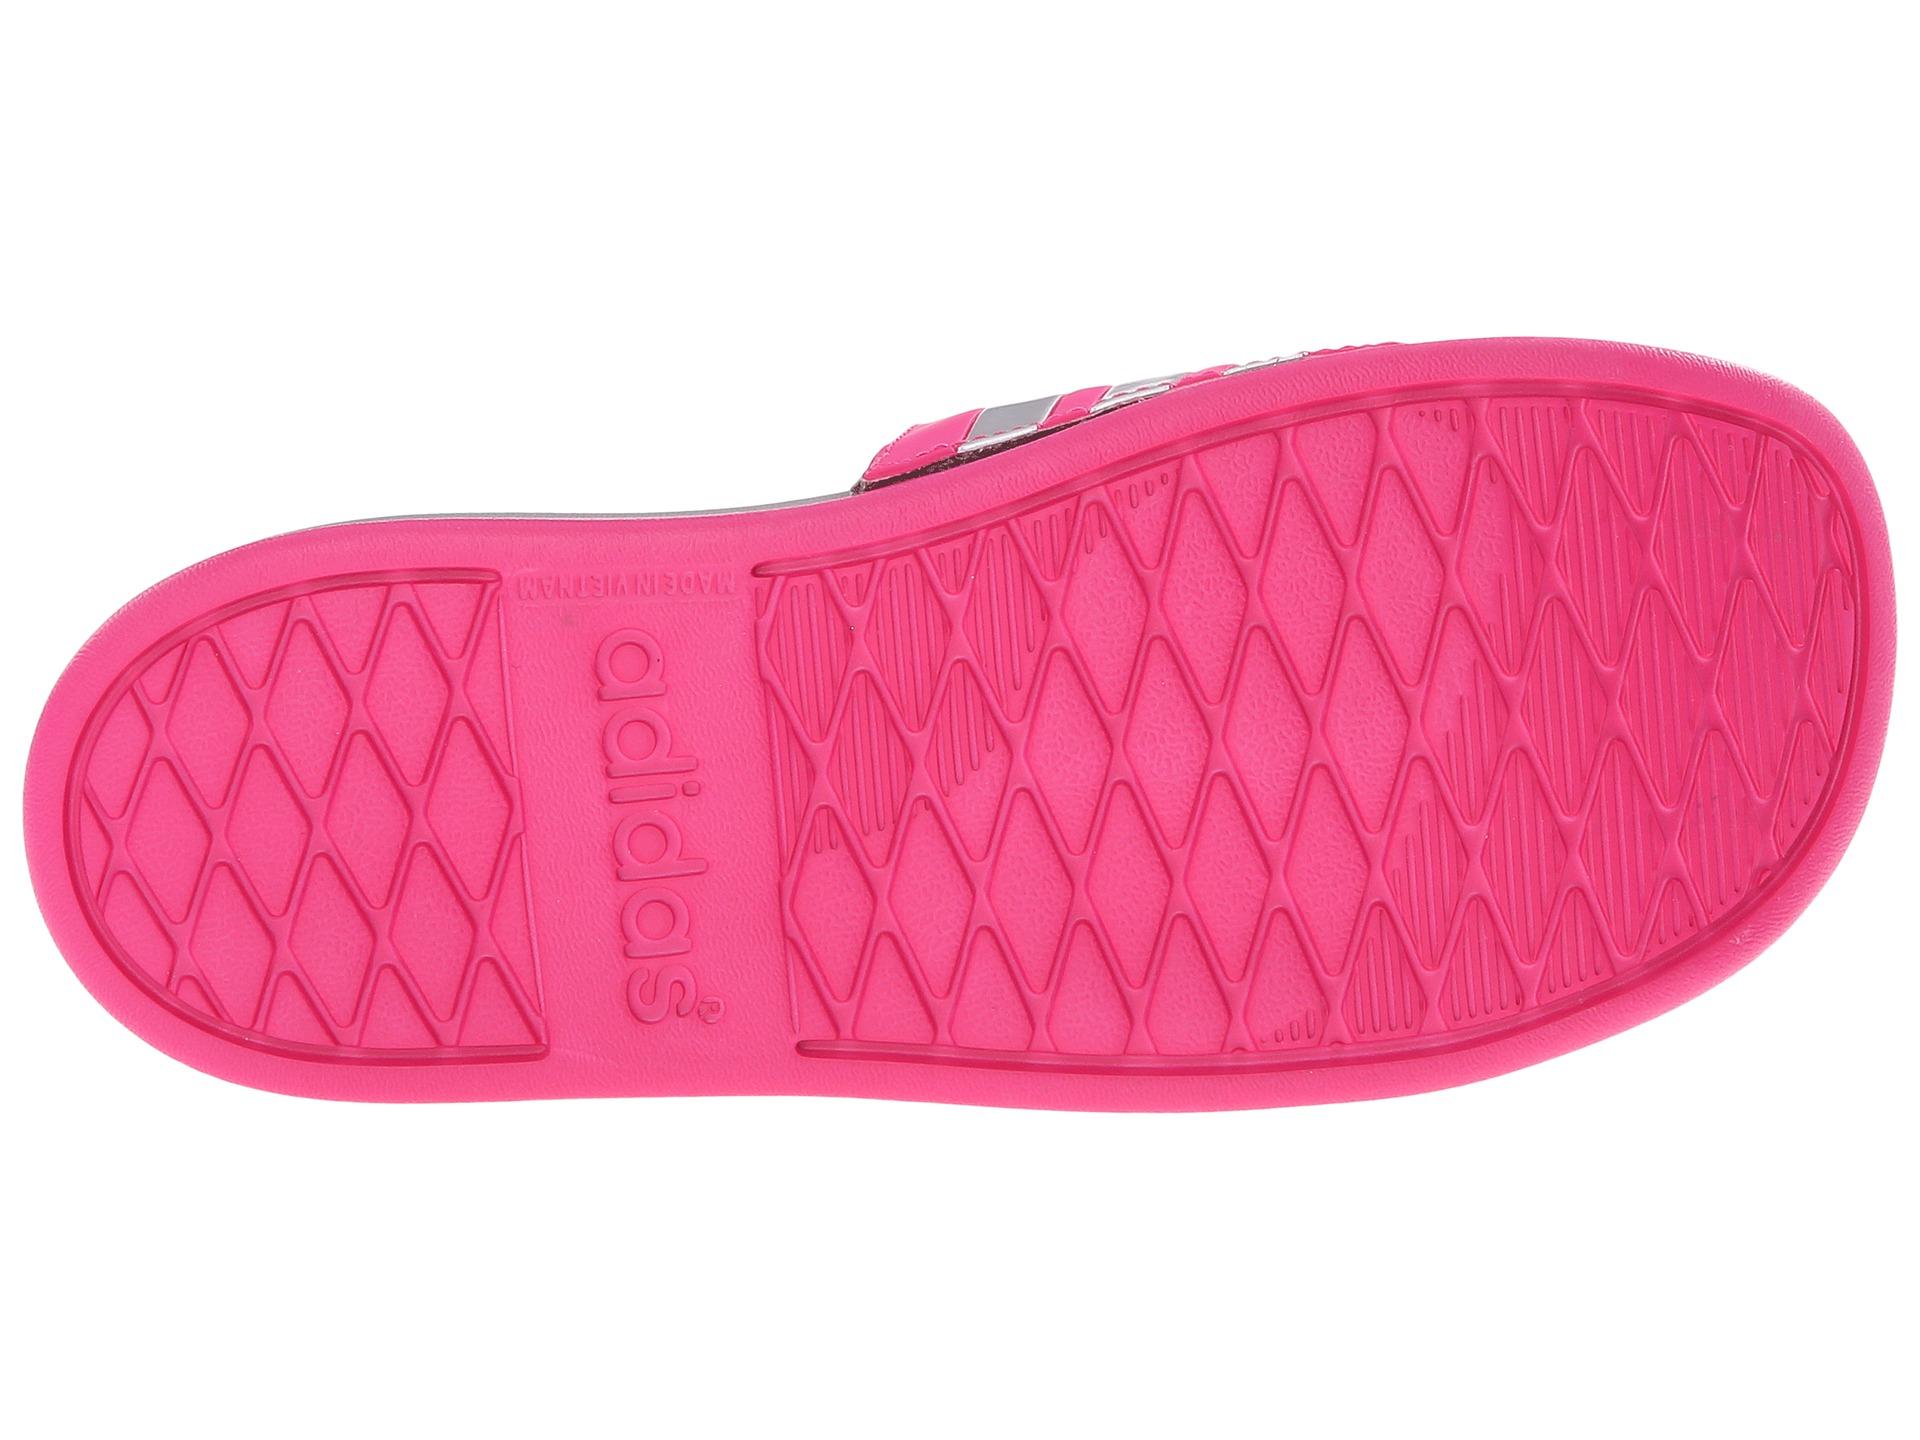 c5eccb6ec61a adidas adilette kids pink on sale   OFF55% Discounts